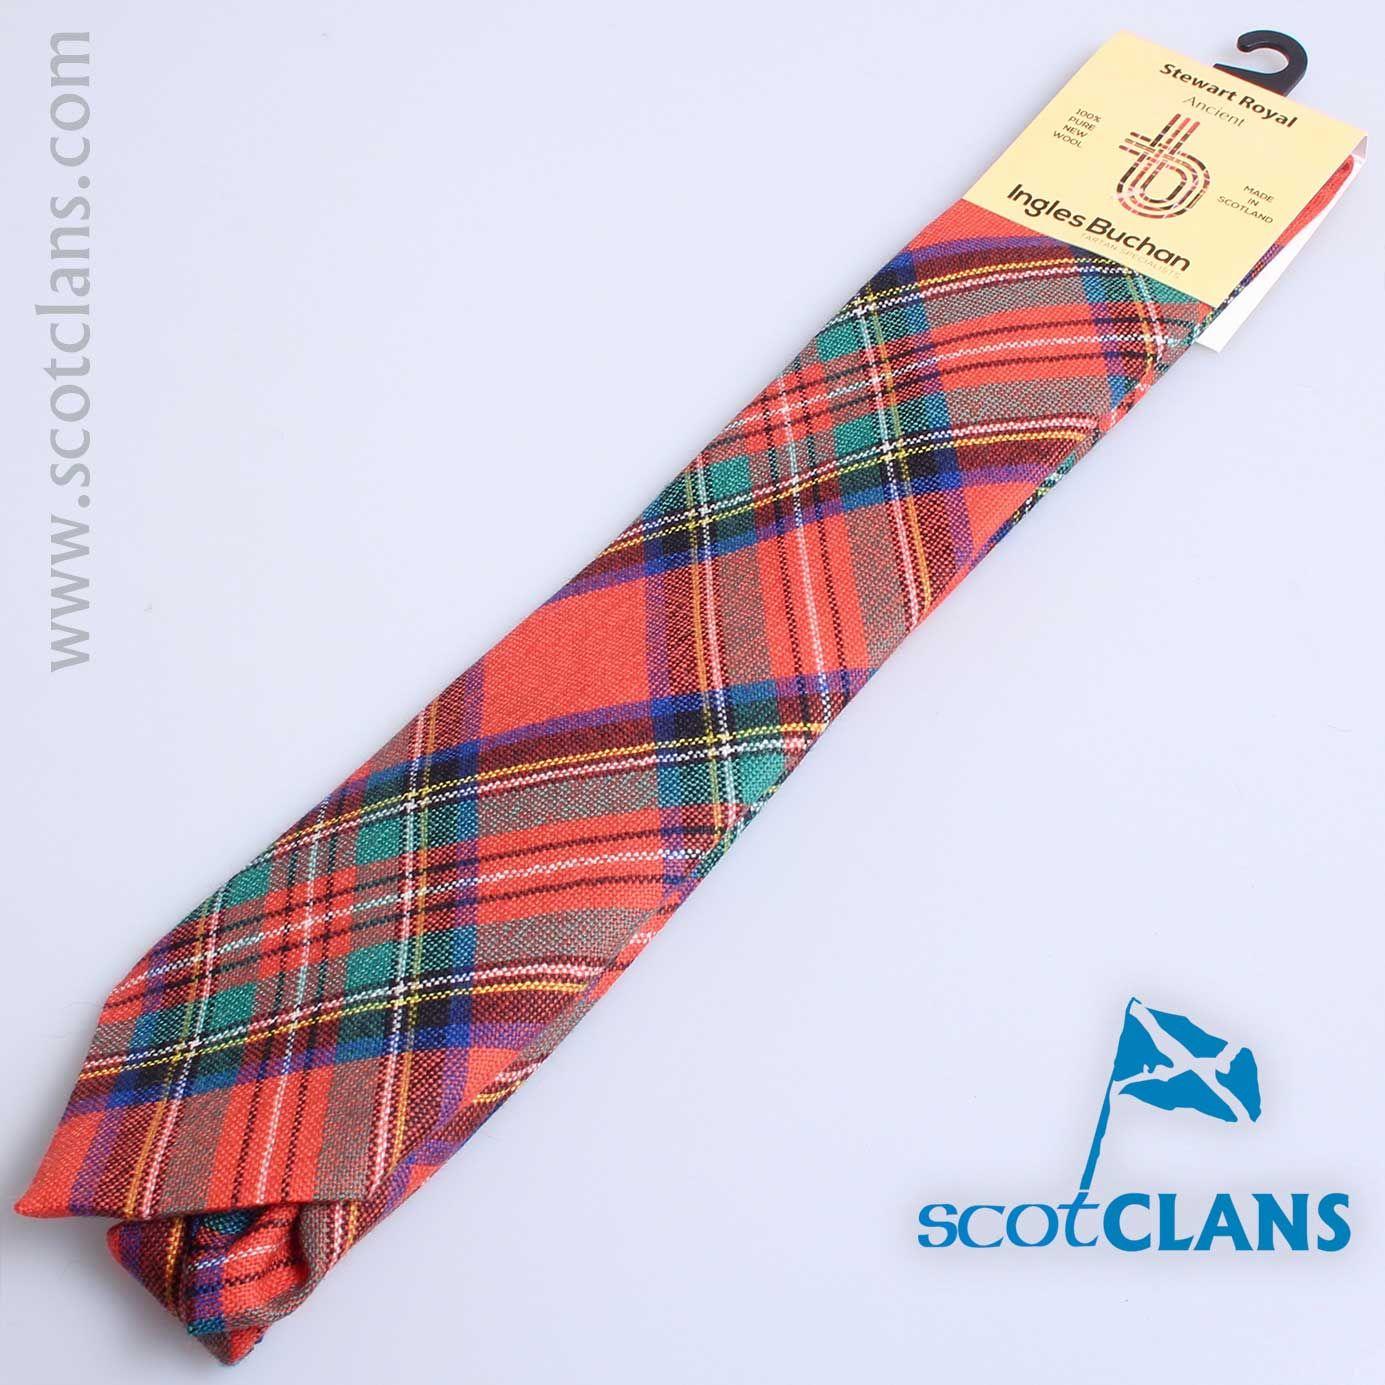 Mens Tie All Wool Made in Scotland Logan and MacLennan Ancient Tartan